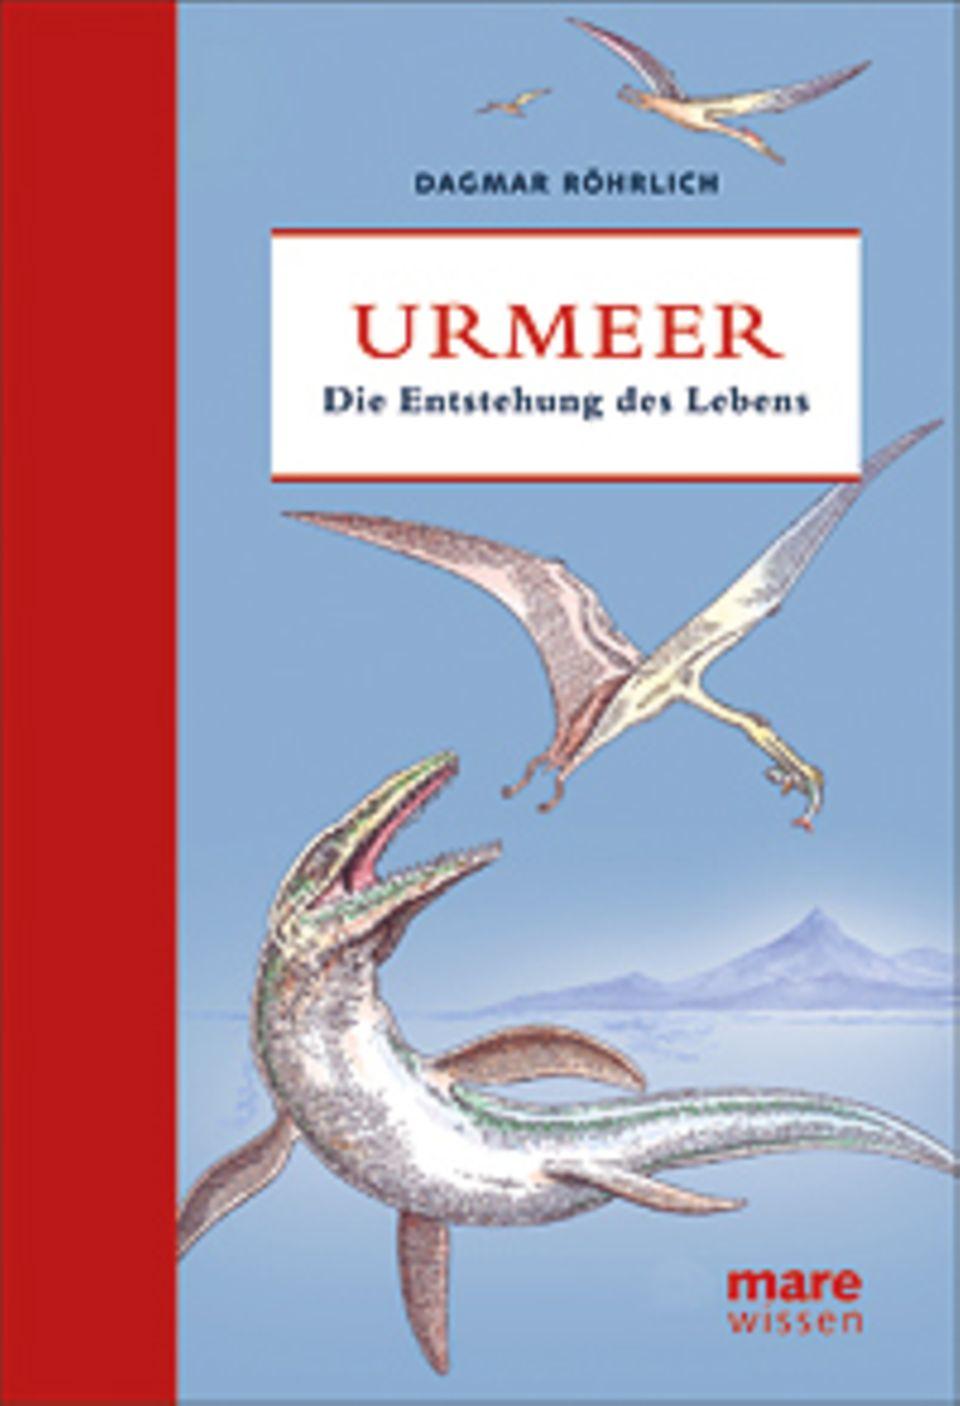 Buchtipp: Buchtipp: Urmeer - die Entstehung des Lebens